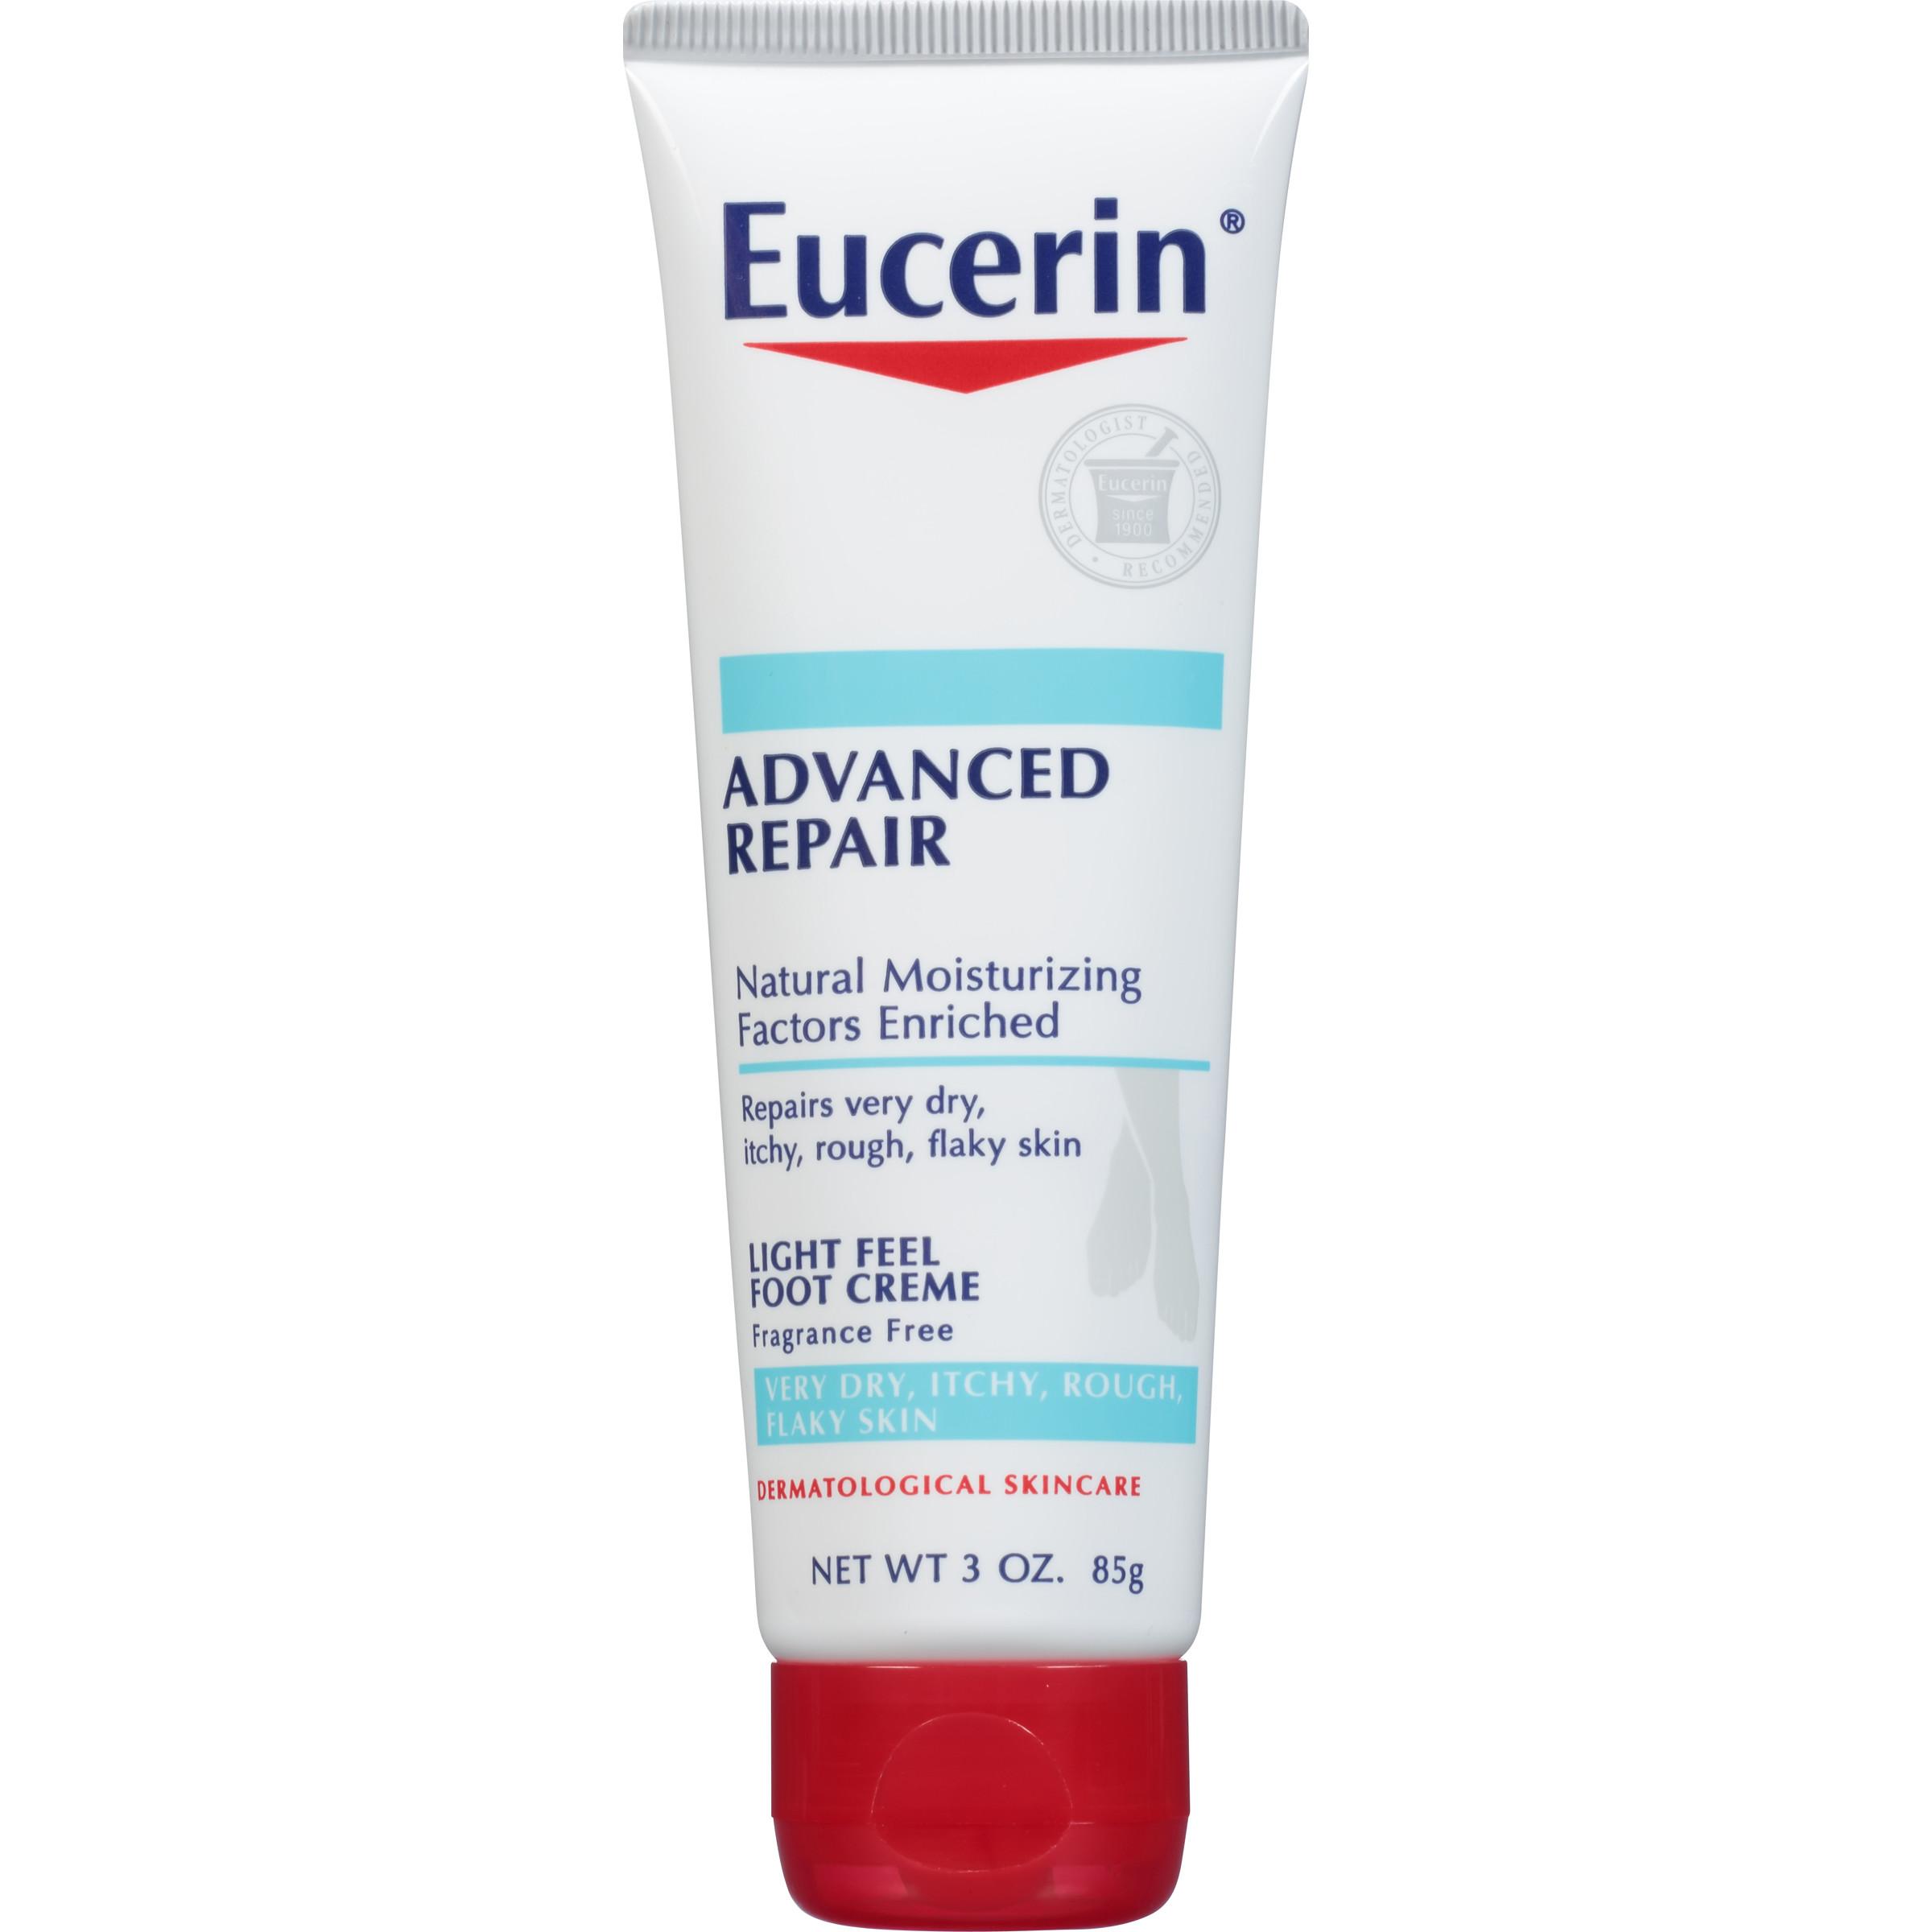 Eucerin Advanced Repair Foot Creme 3 oz.